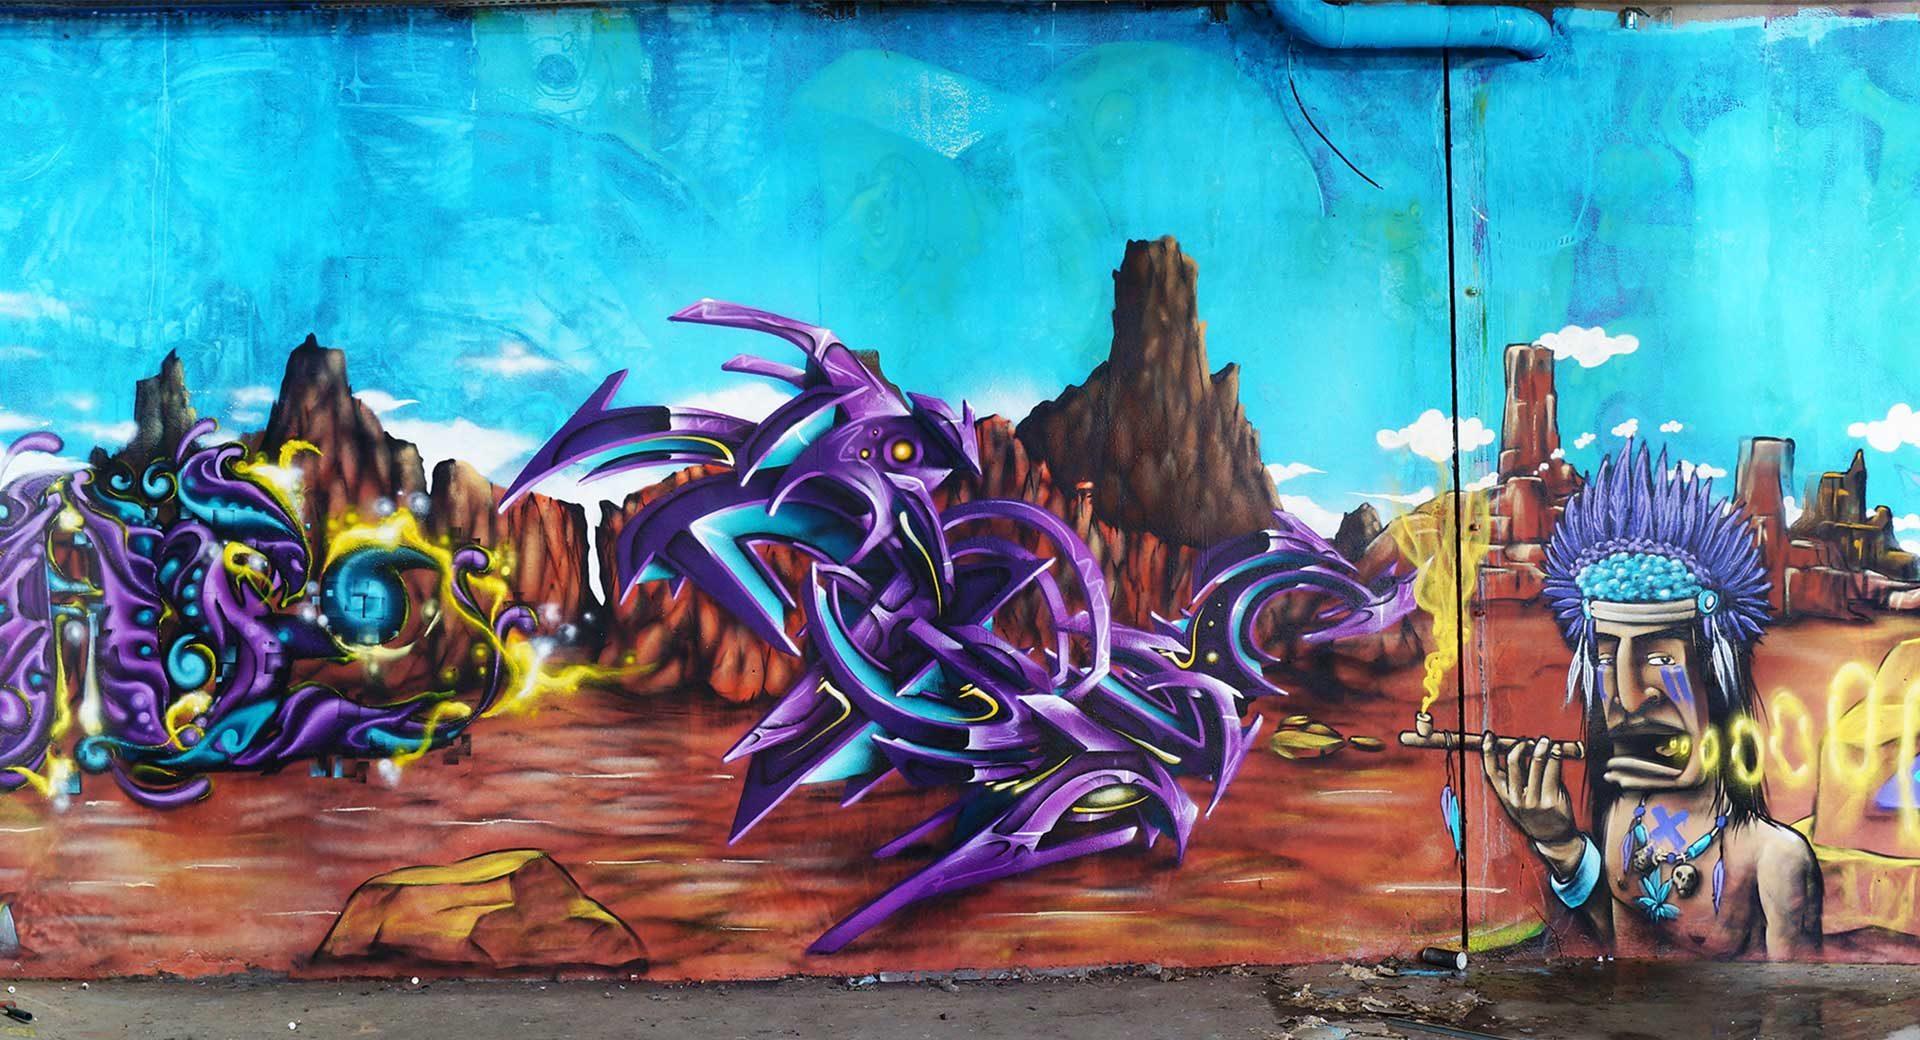 Spazm - Graffiti